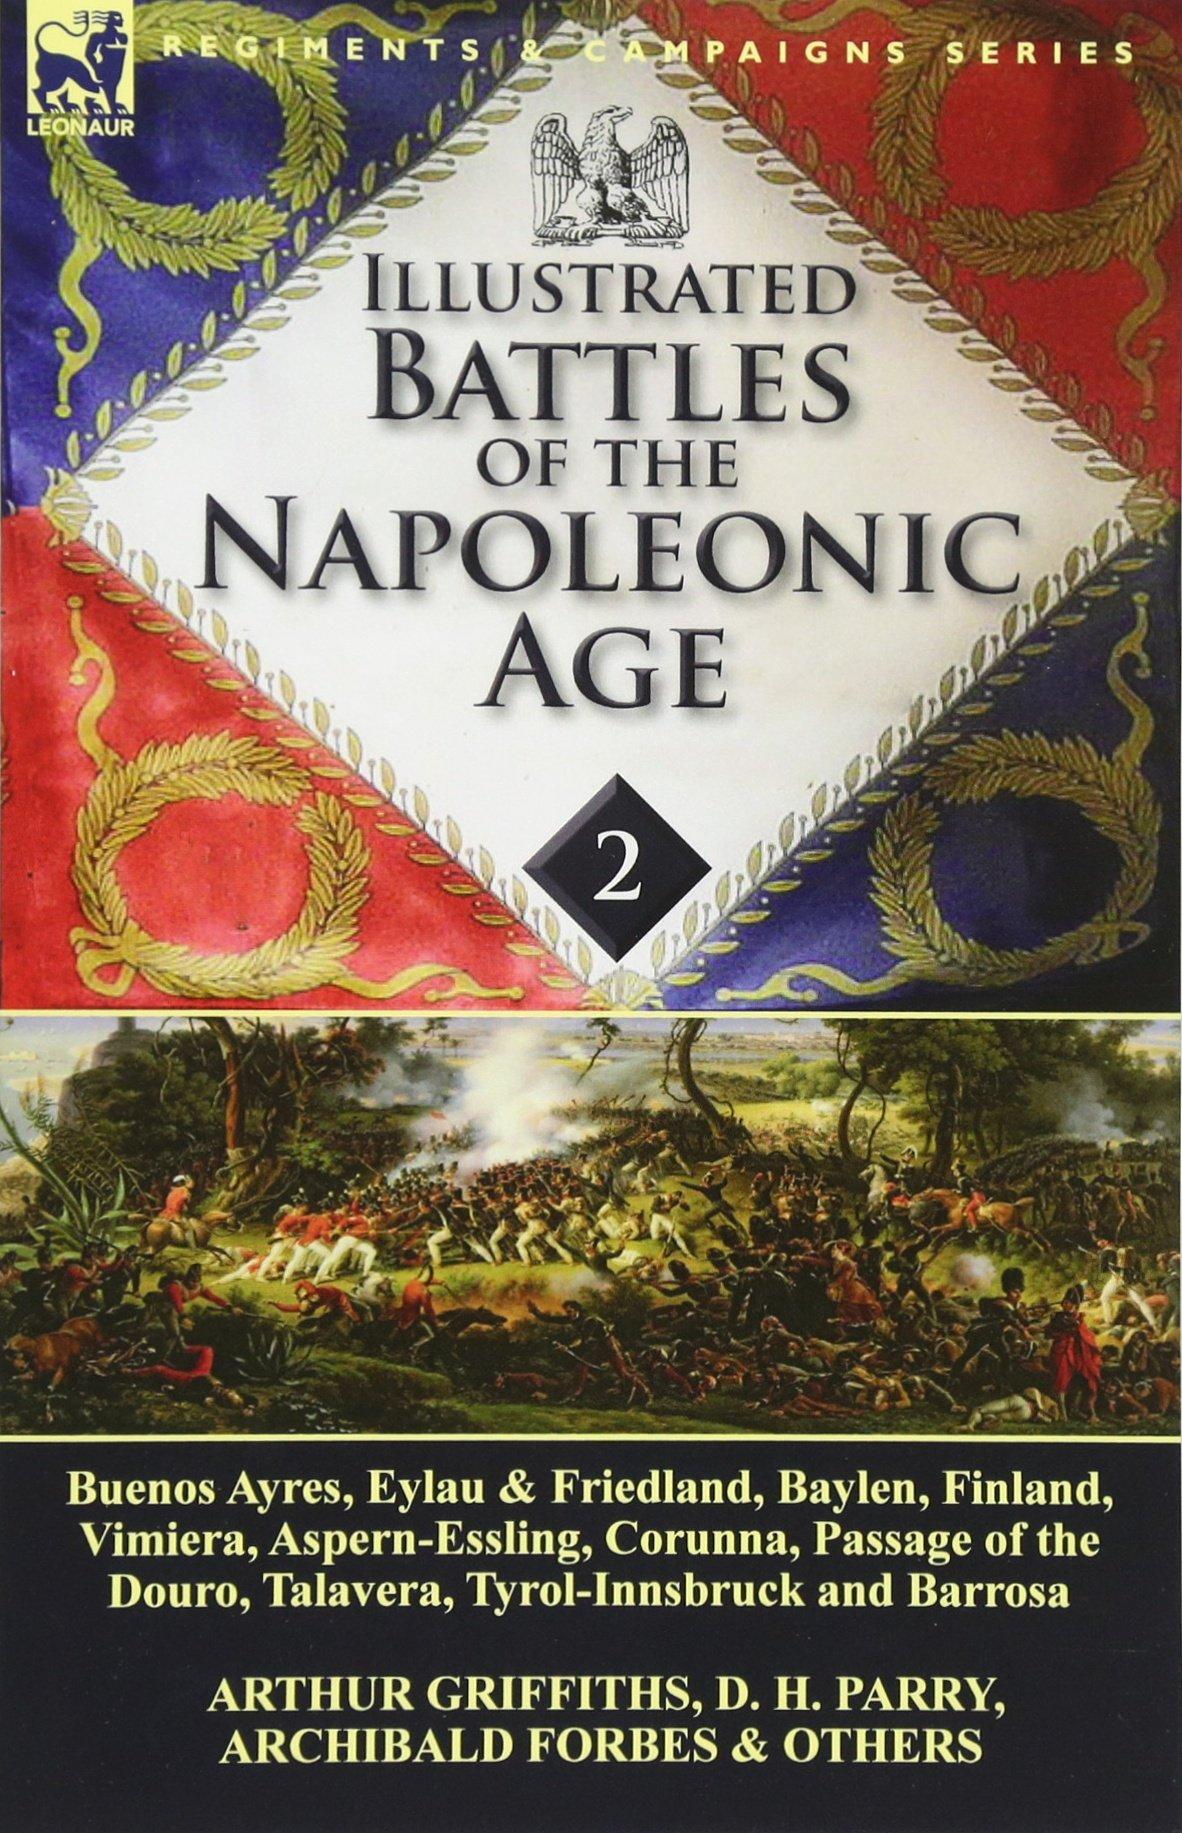 Illustrated Battles of the Napoleonic Age-Volume 2: Buenos Ayres, Eylau & Friedland, Baylen, Finland, Vimiera, Aspern-Essling, Corunna, Passage of the Douro, Talavera, Tyrol-Innsbruck and Barrosa